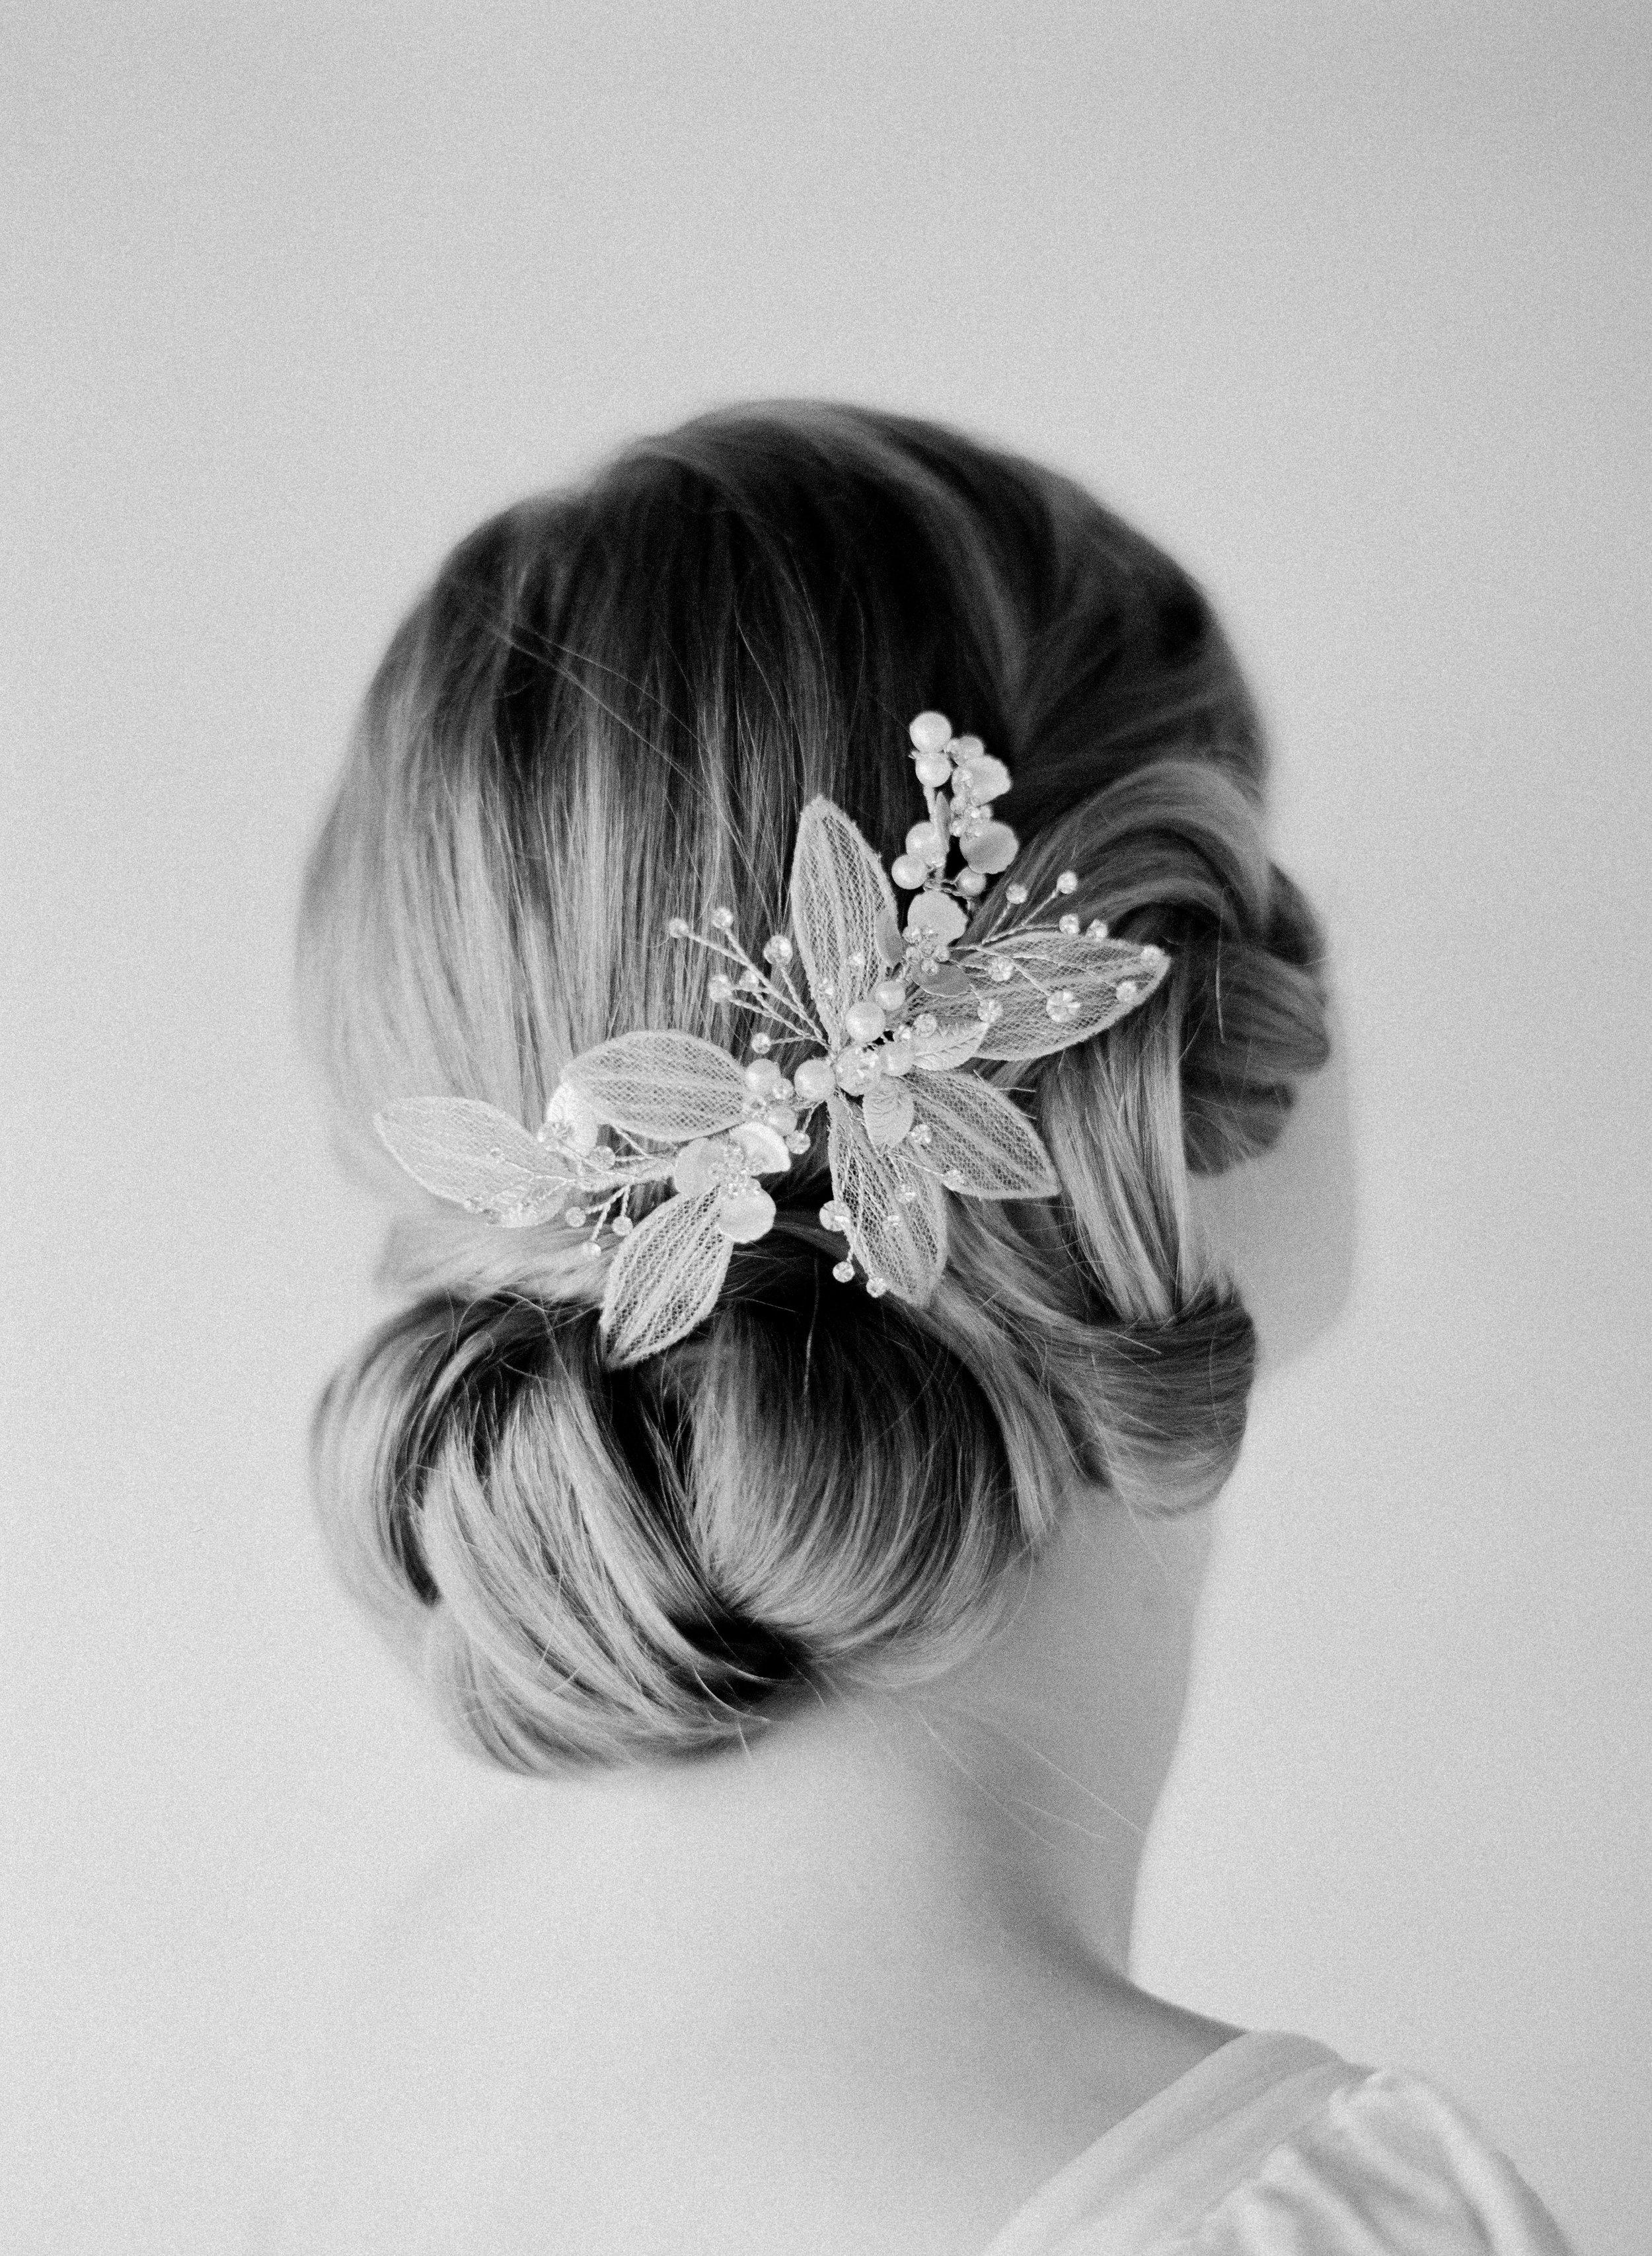 BHLDN-Winter-Bride-213-Jen_Huang-000086570001.jpg